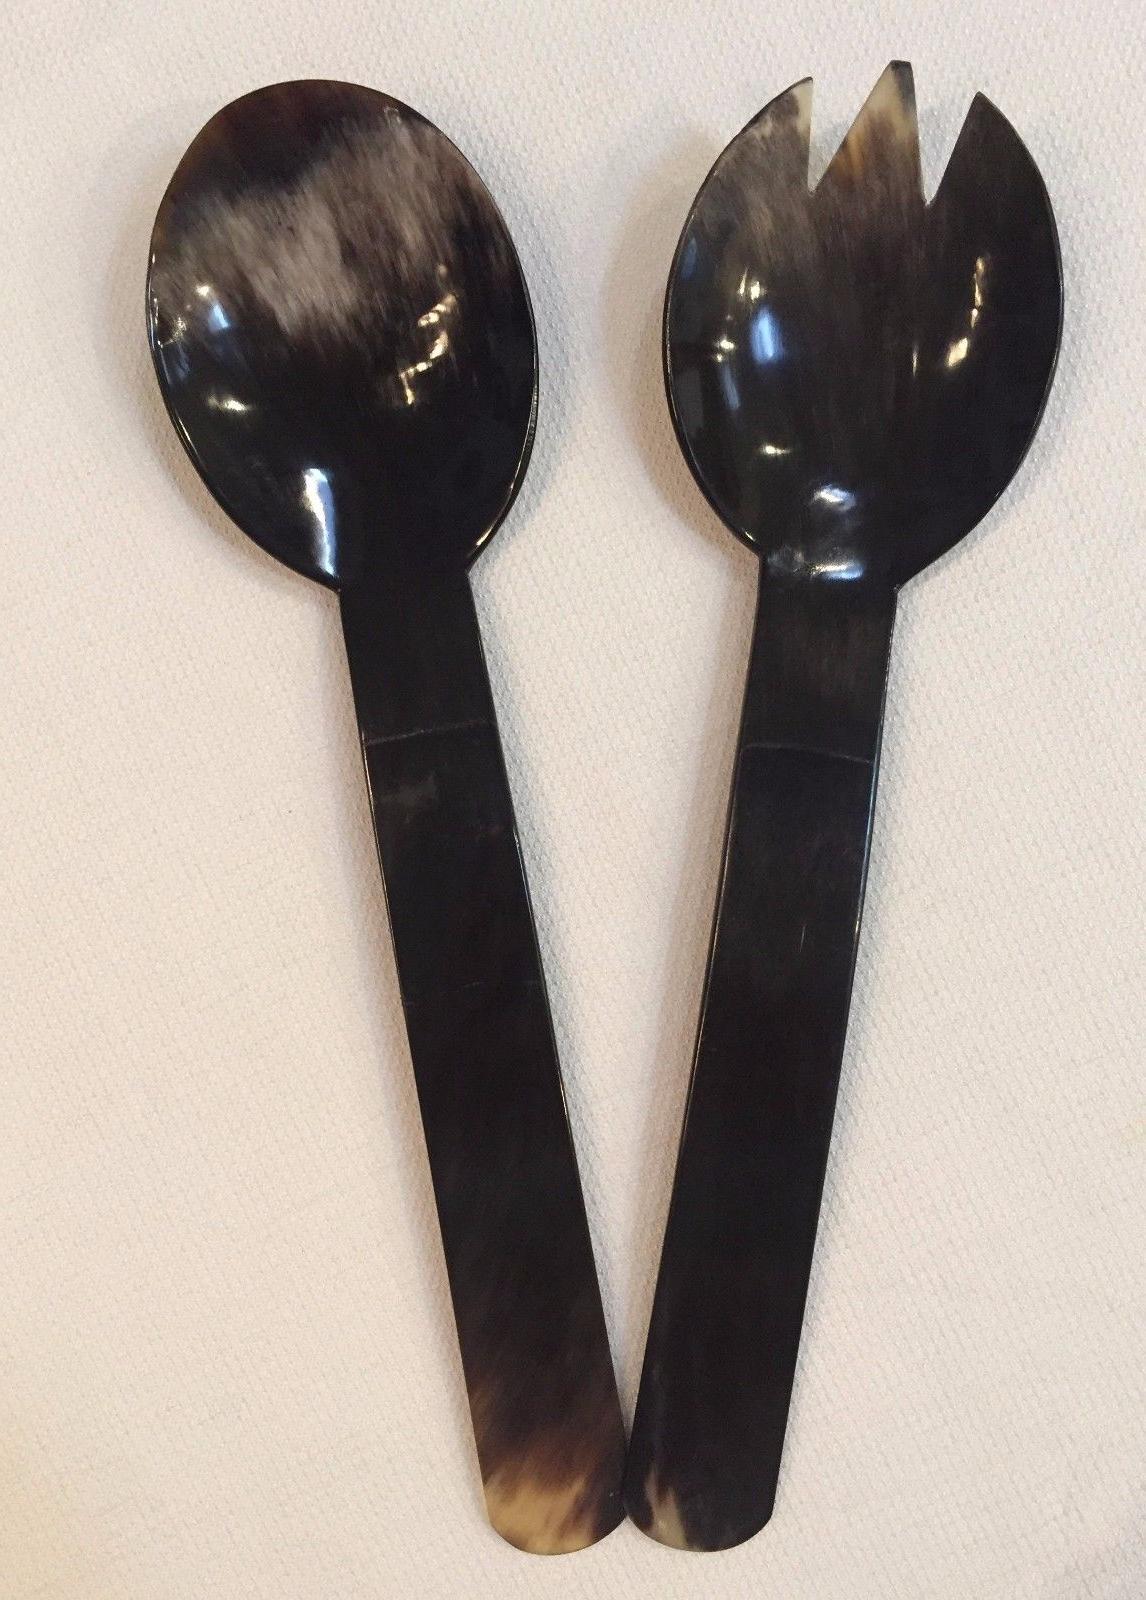 salad serving fork and spoon set dining